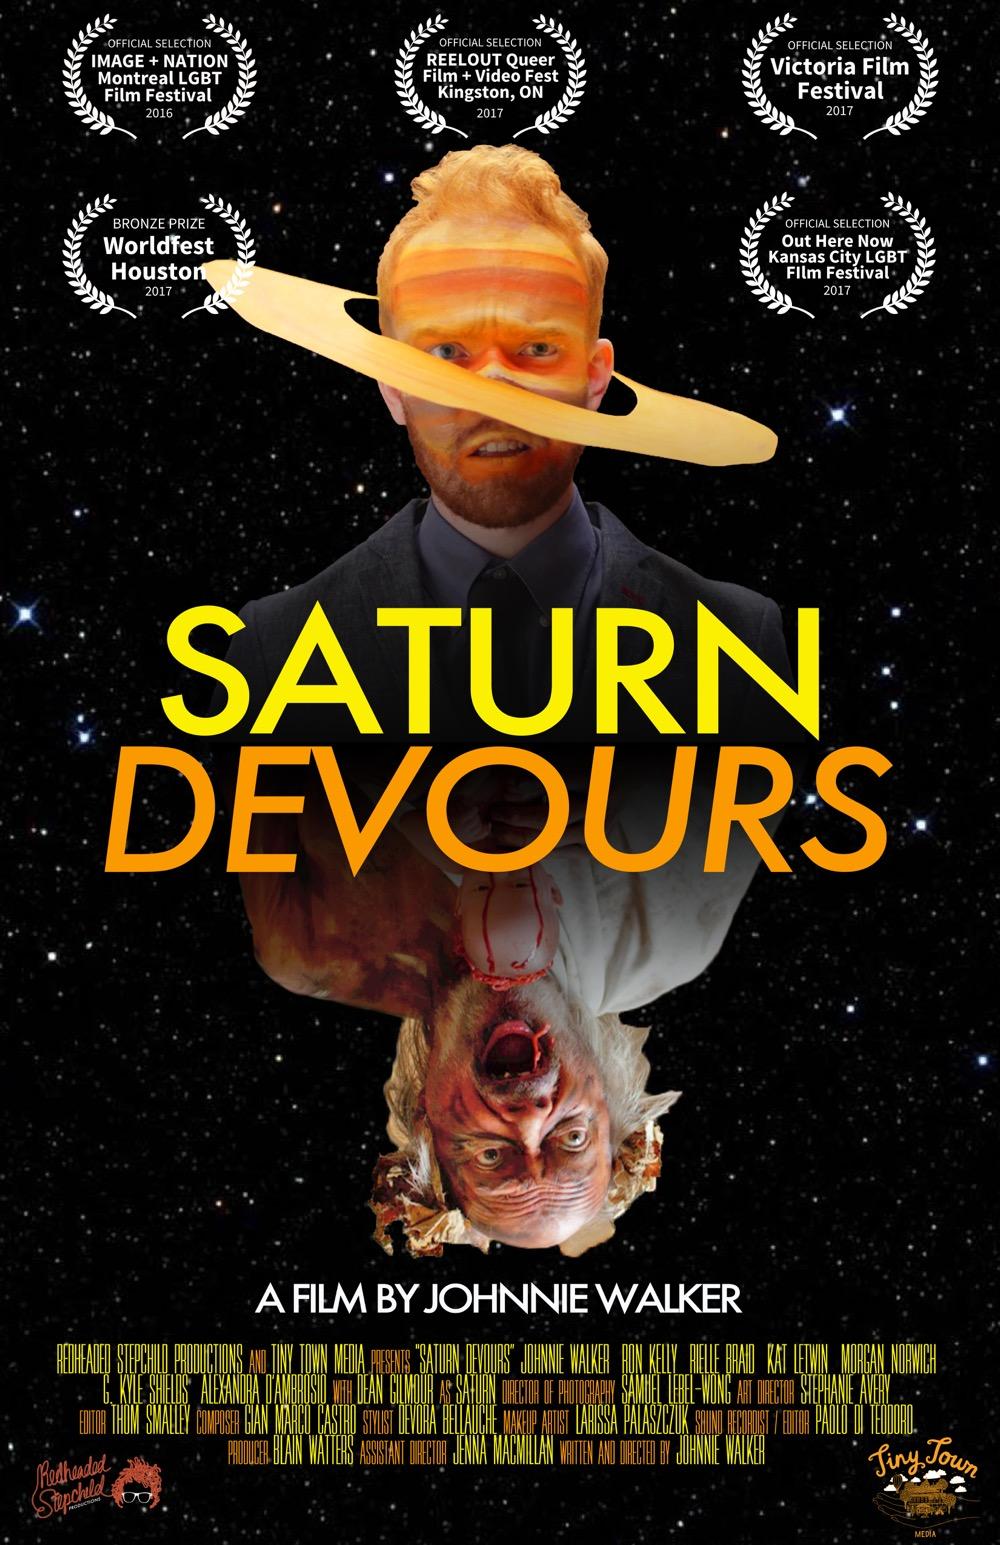 Saturn Devours film poster